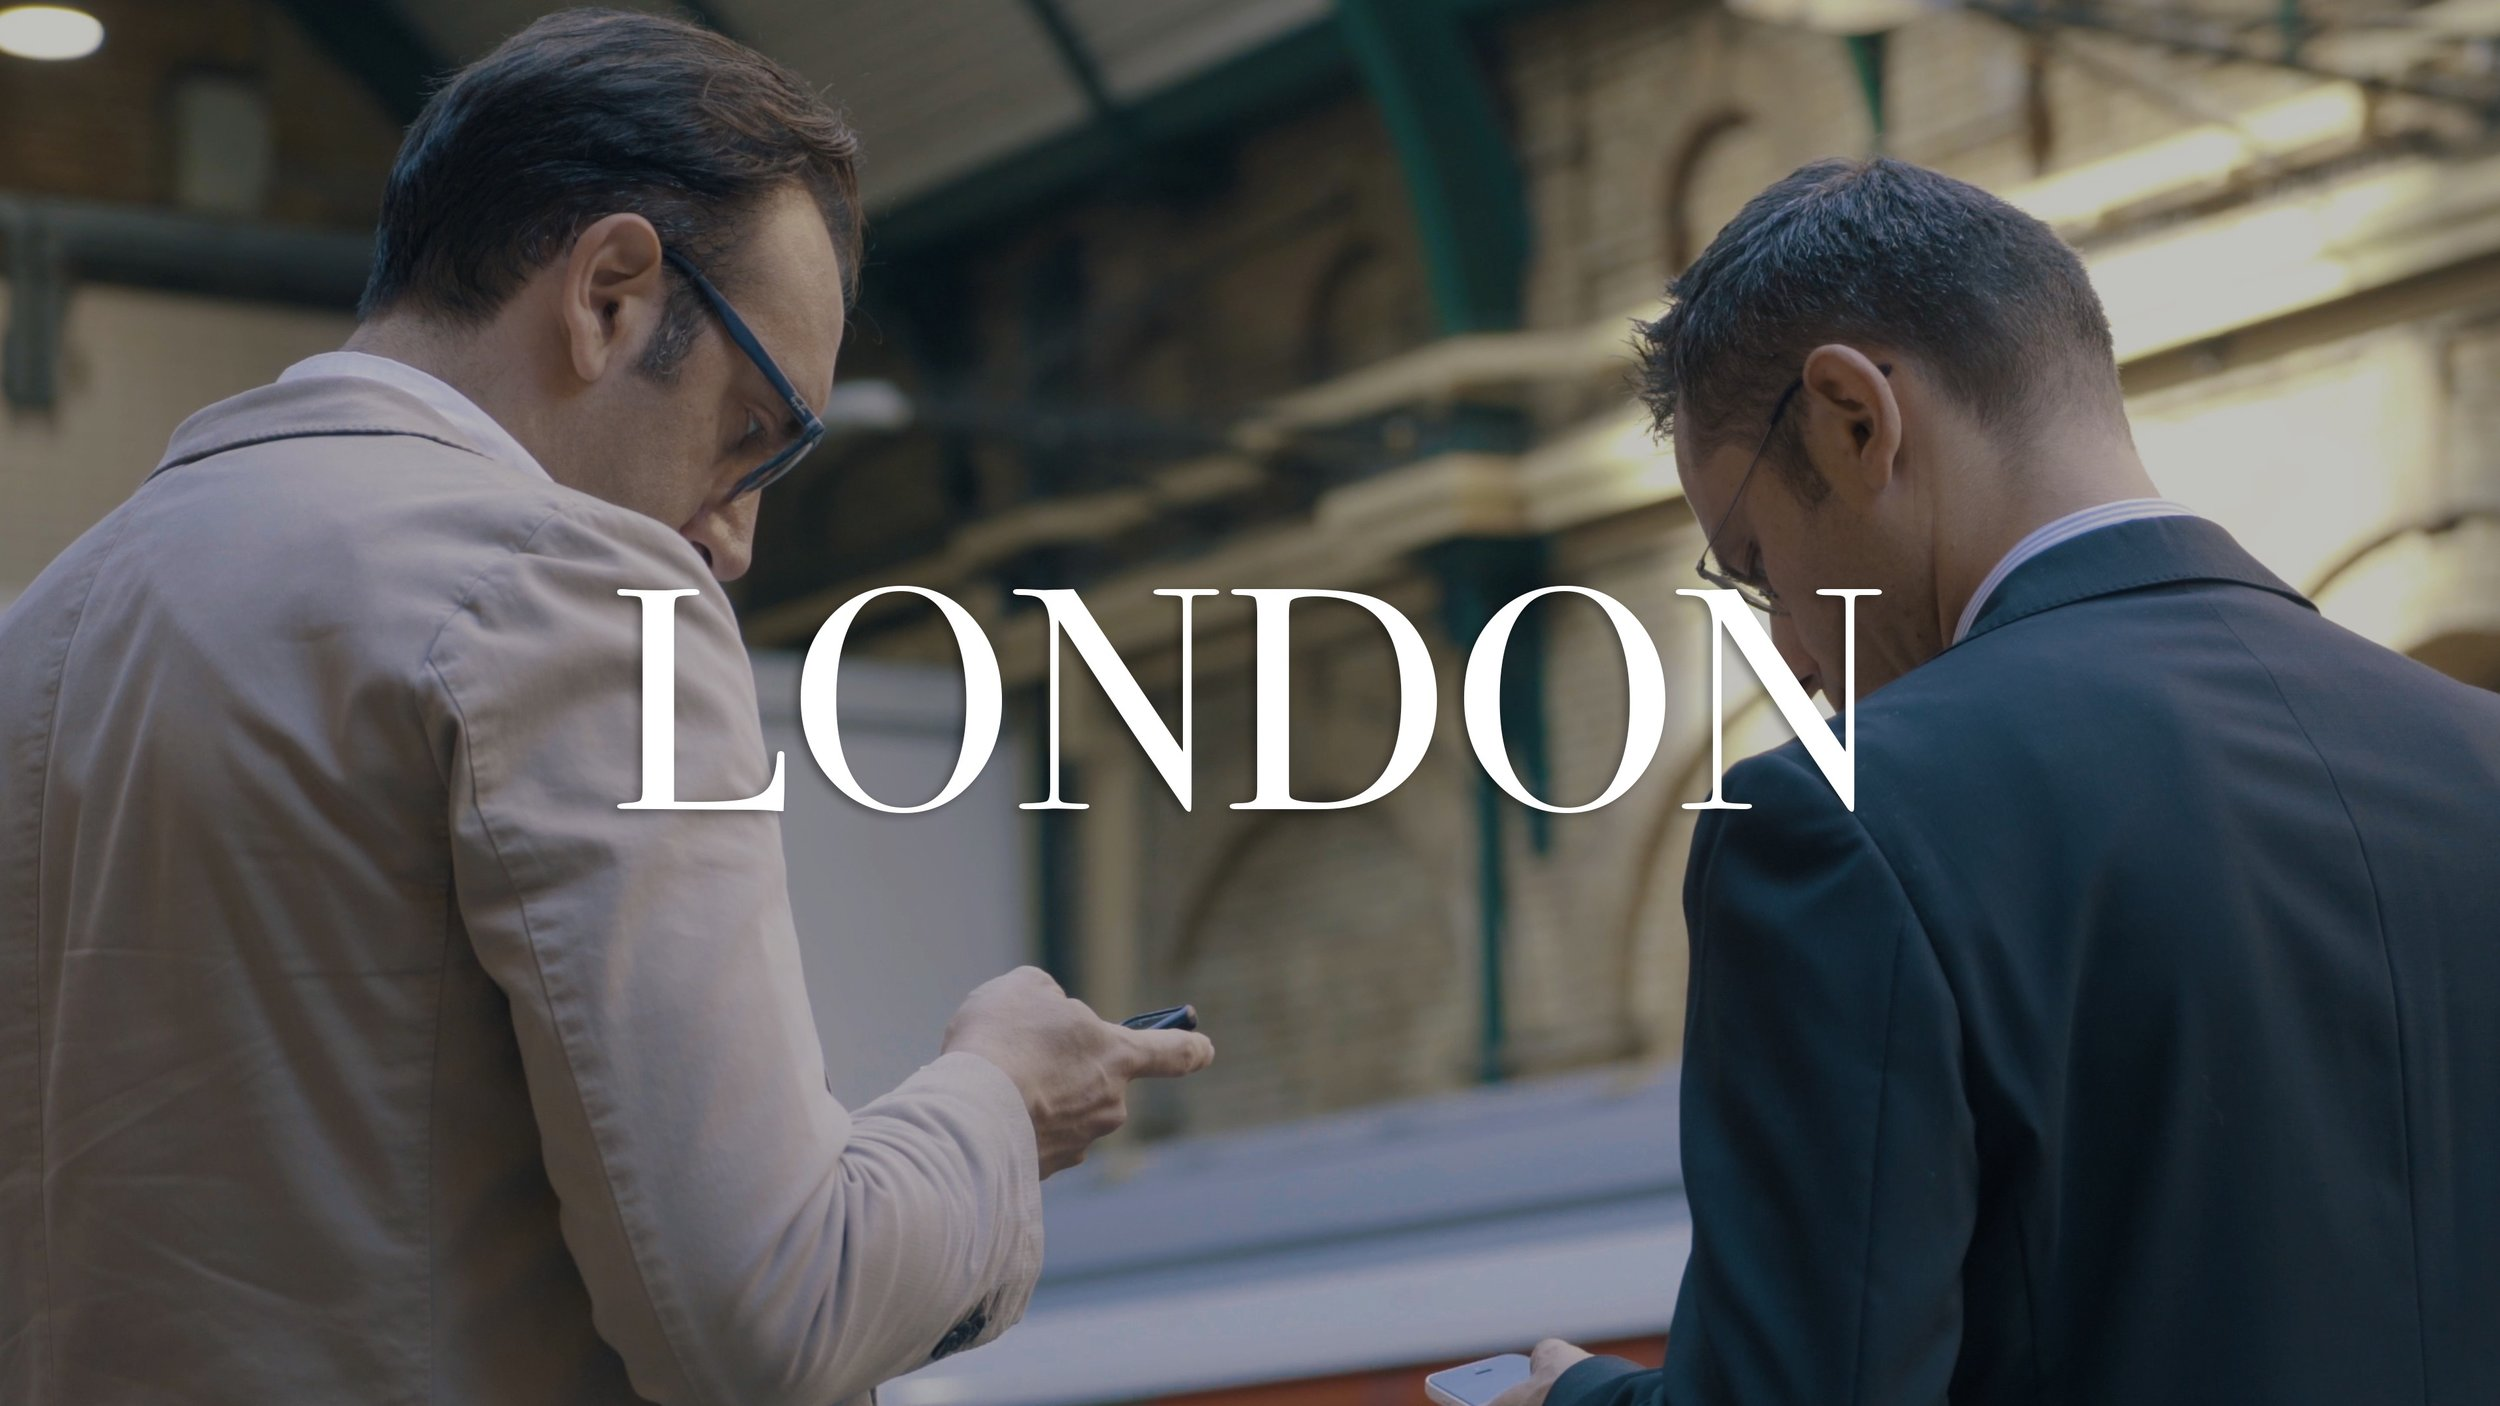 T_London-squashed.jpg